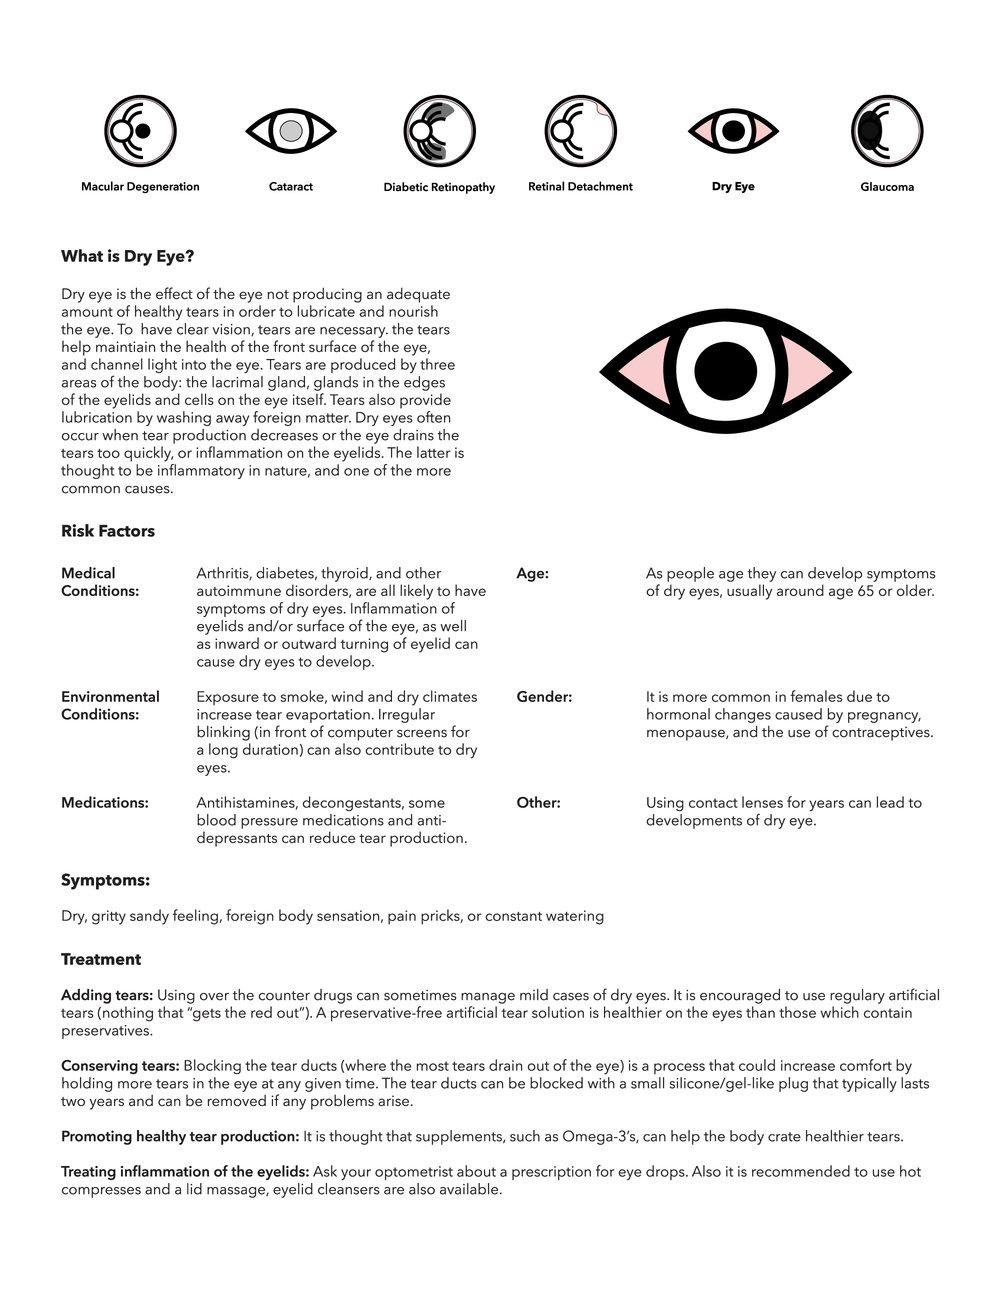 Repko Family Vision Diabetic Eye Disease Handout